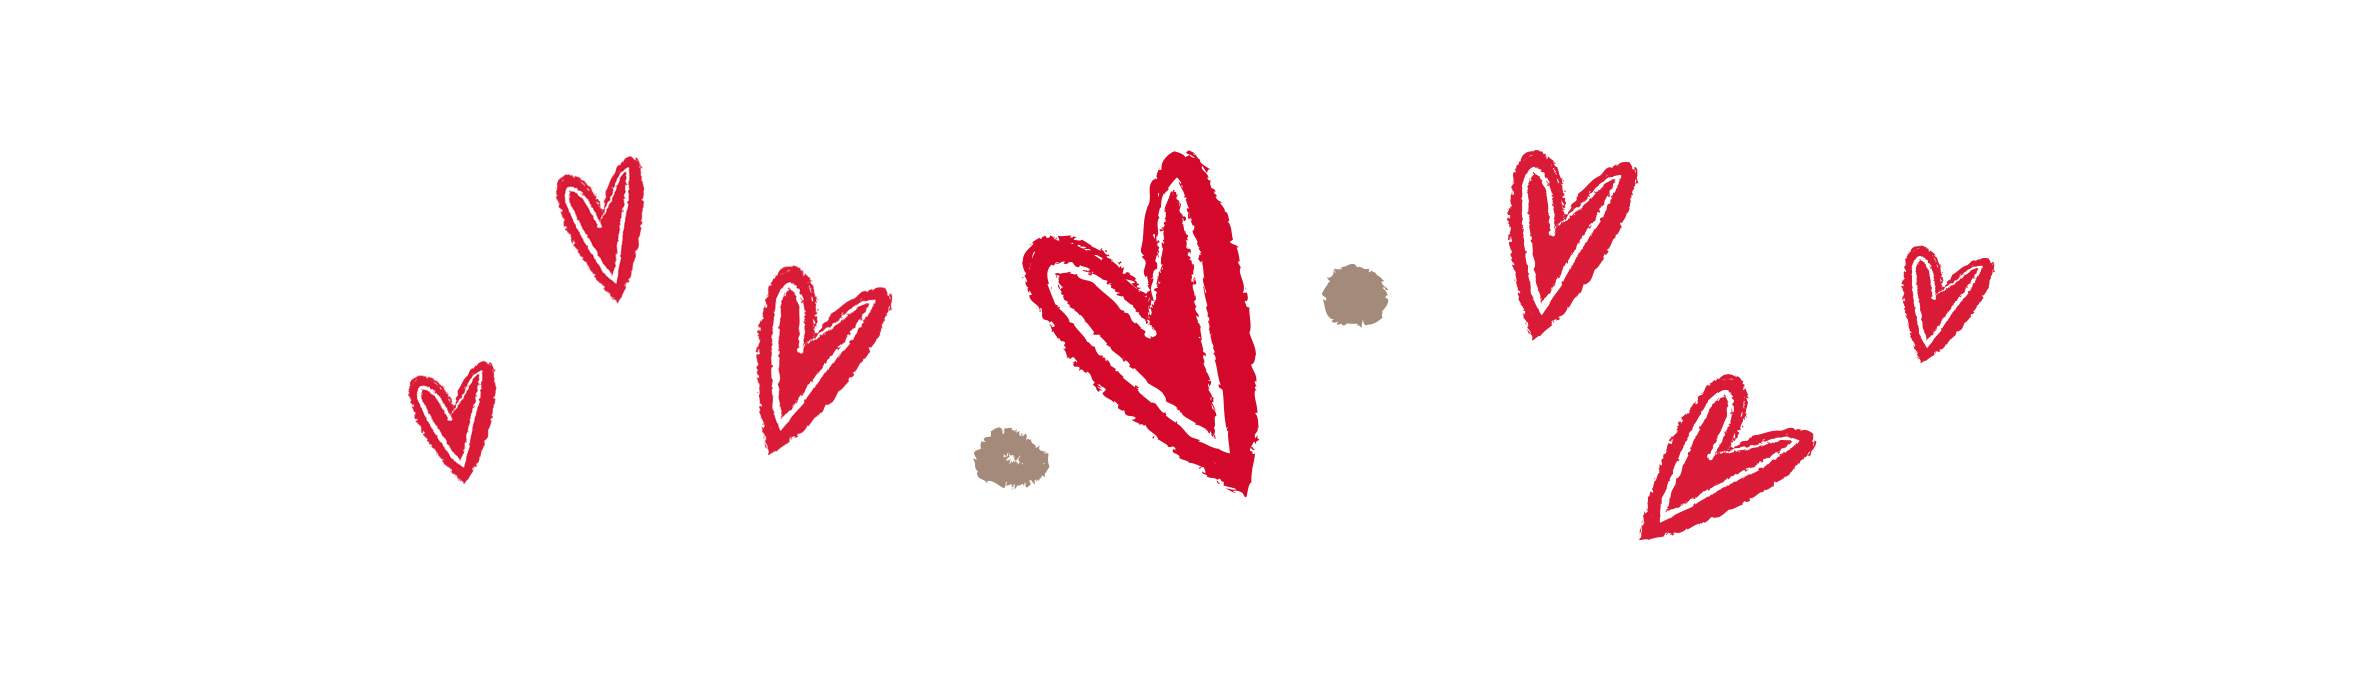 MagòParty-Pix Love.jpg